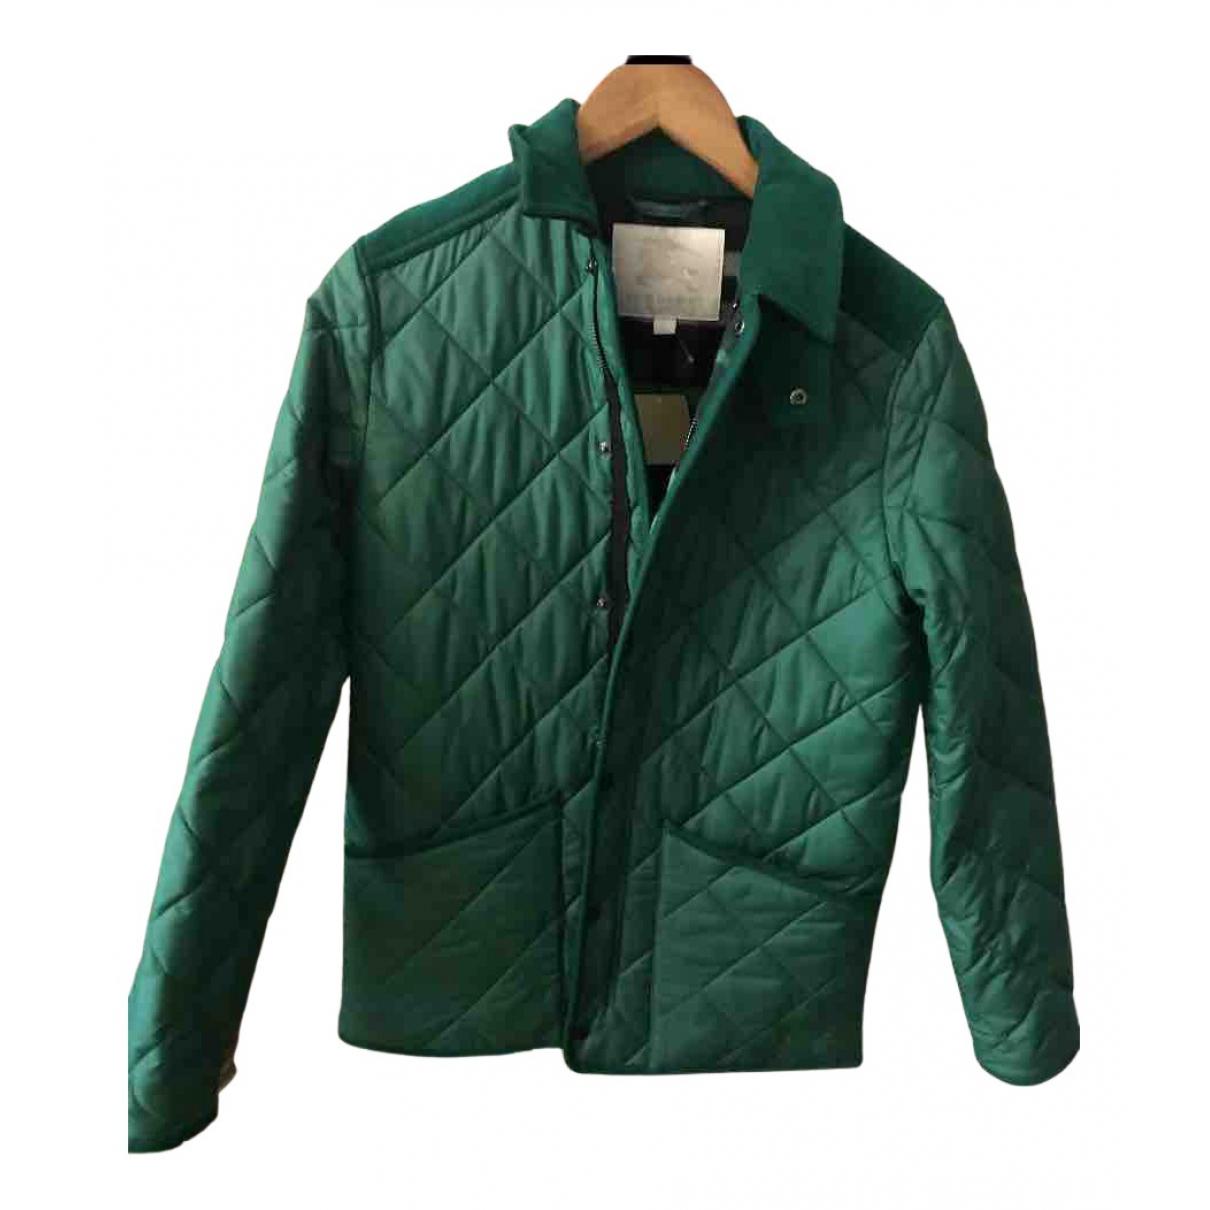 Burberry N Green jacket & coat for Kids 14 years - S UK